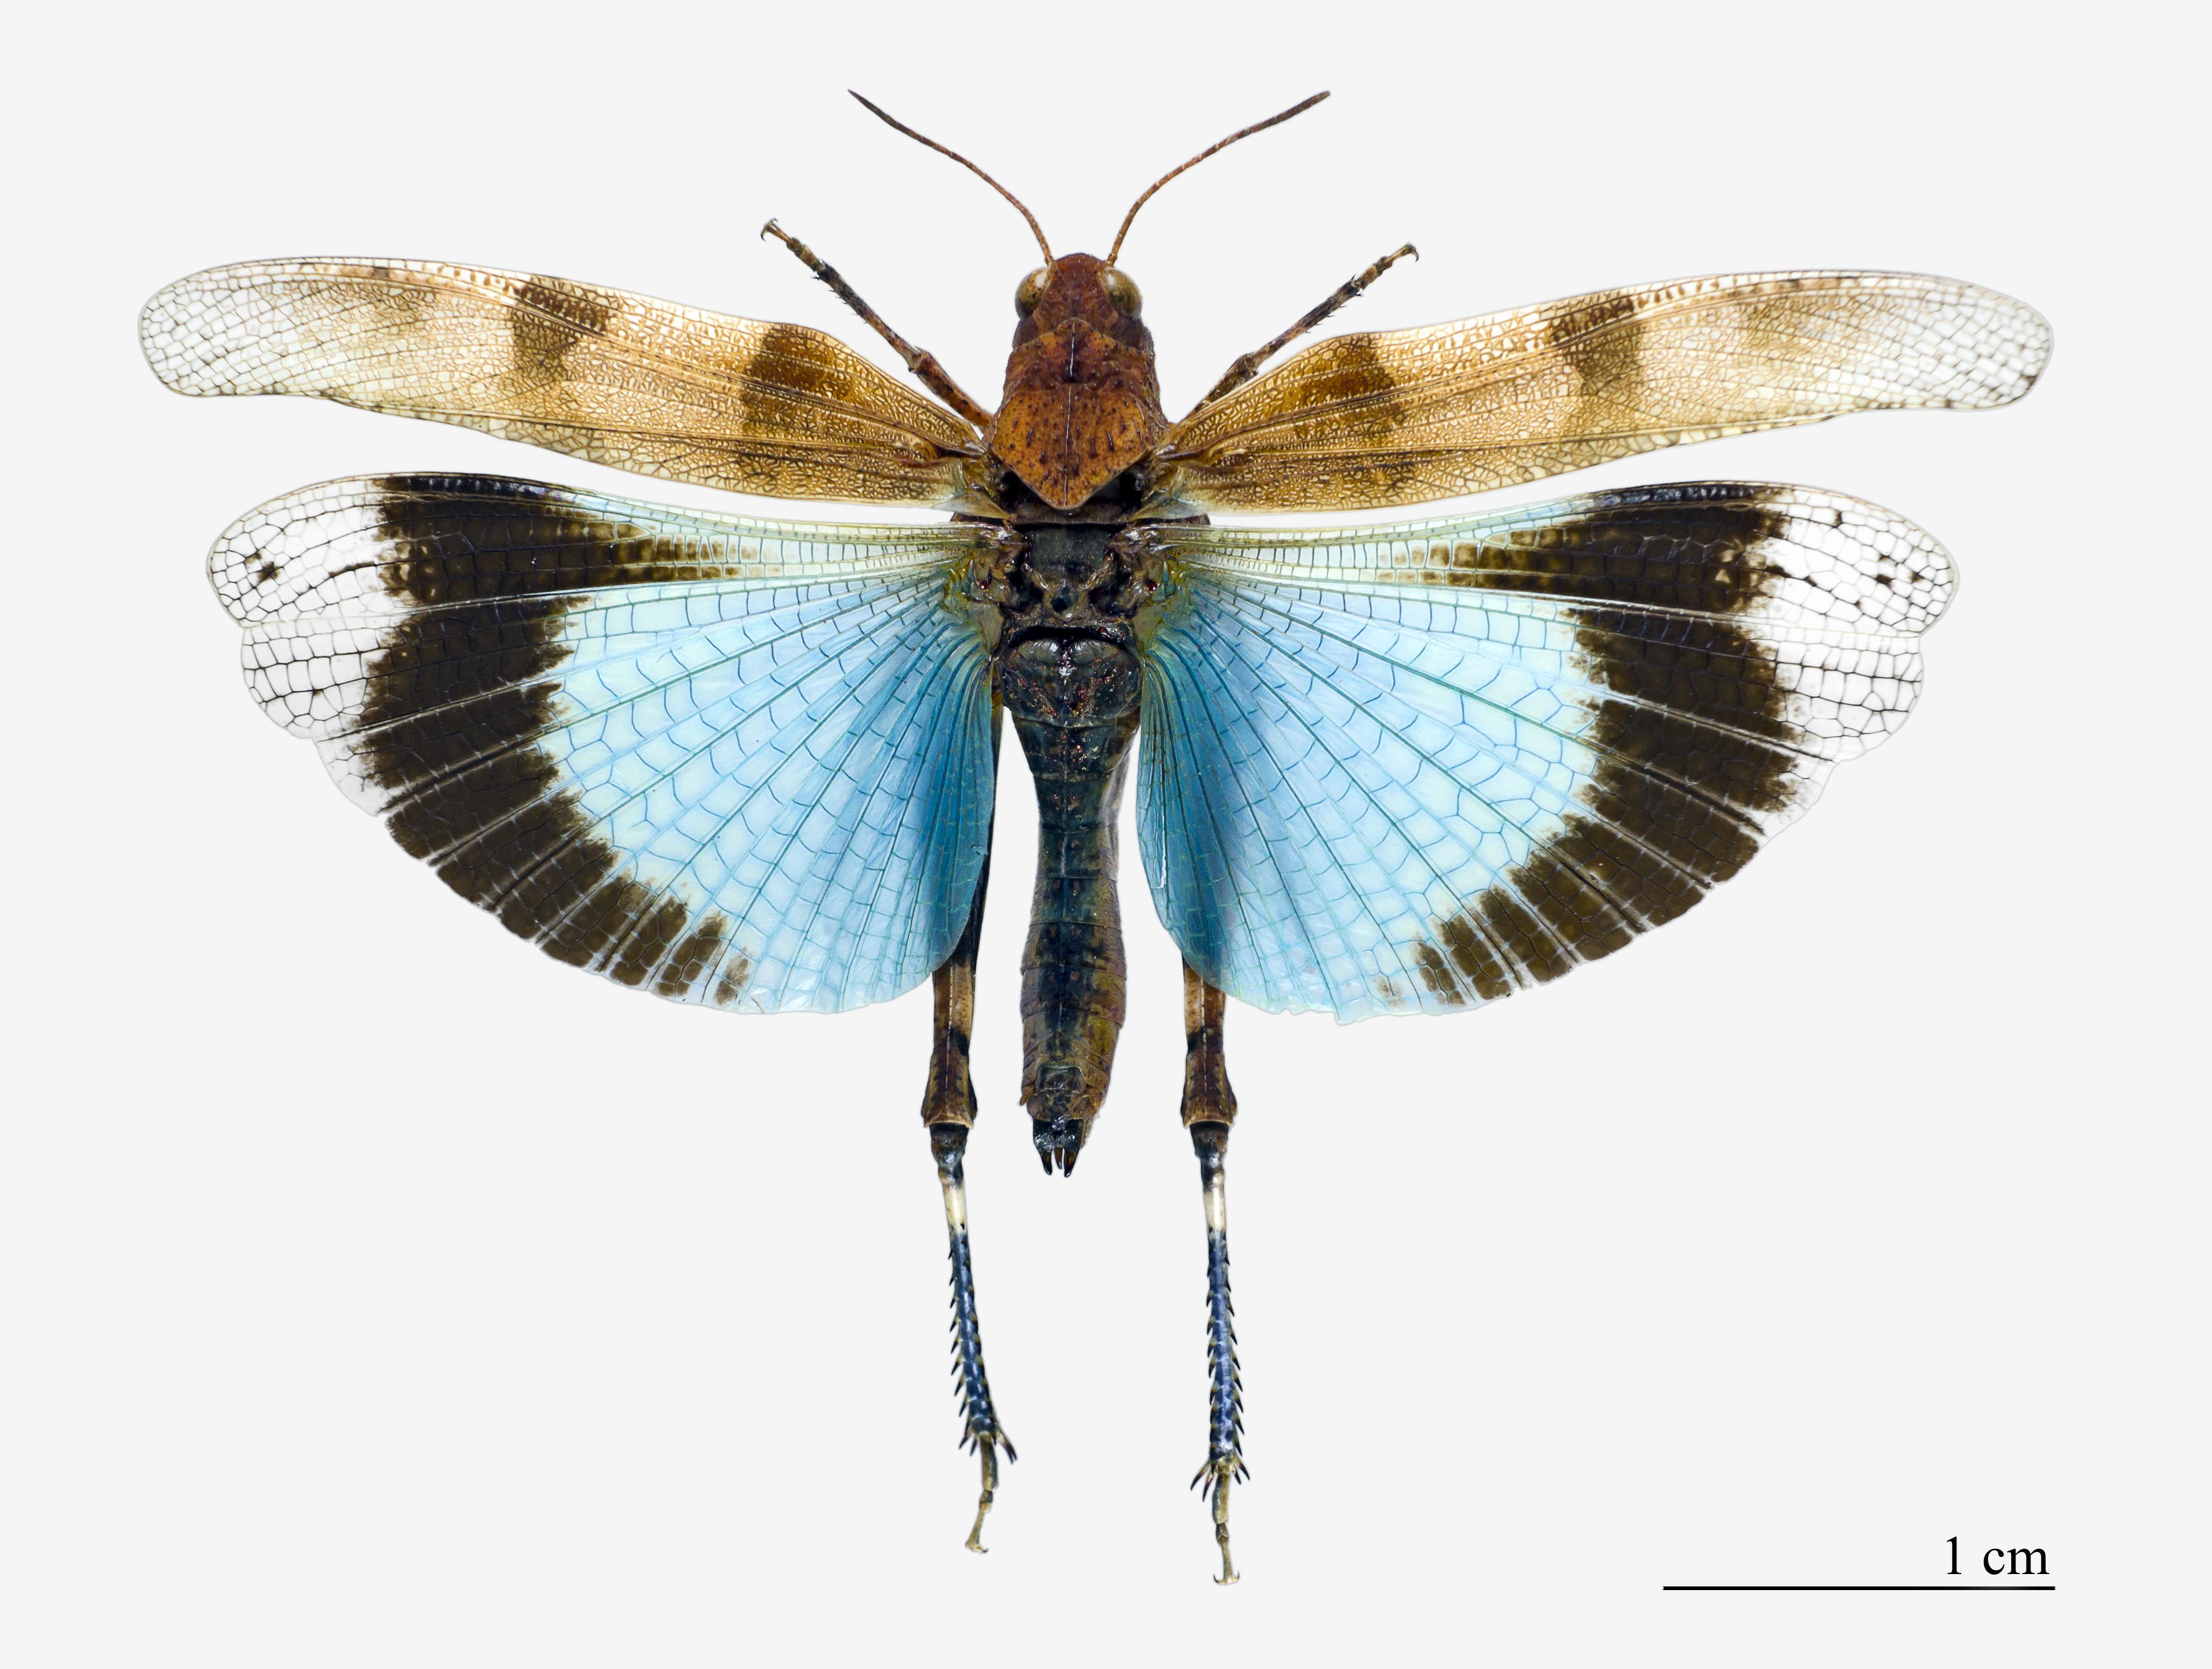 Oedipoda_caerulescens_MHNT.jpg